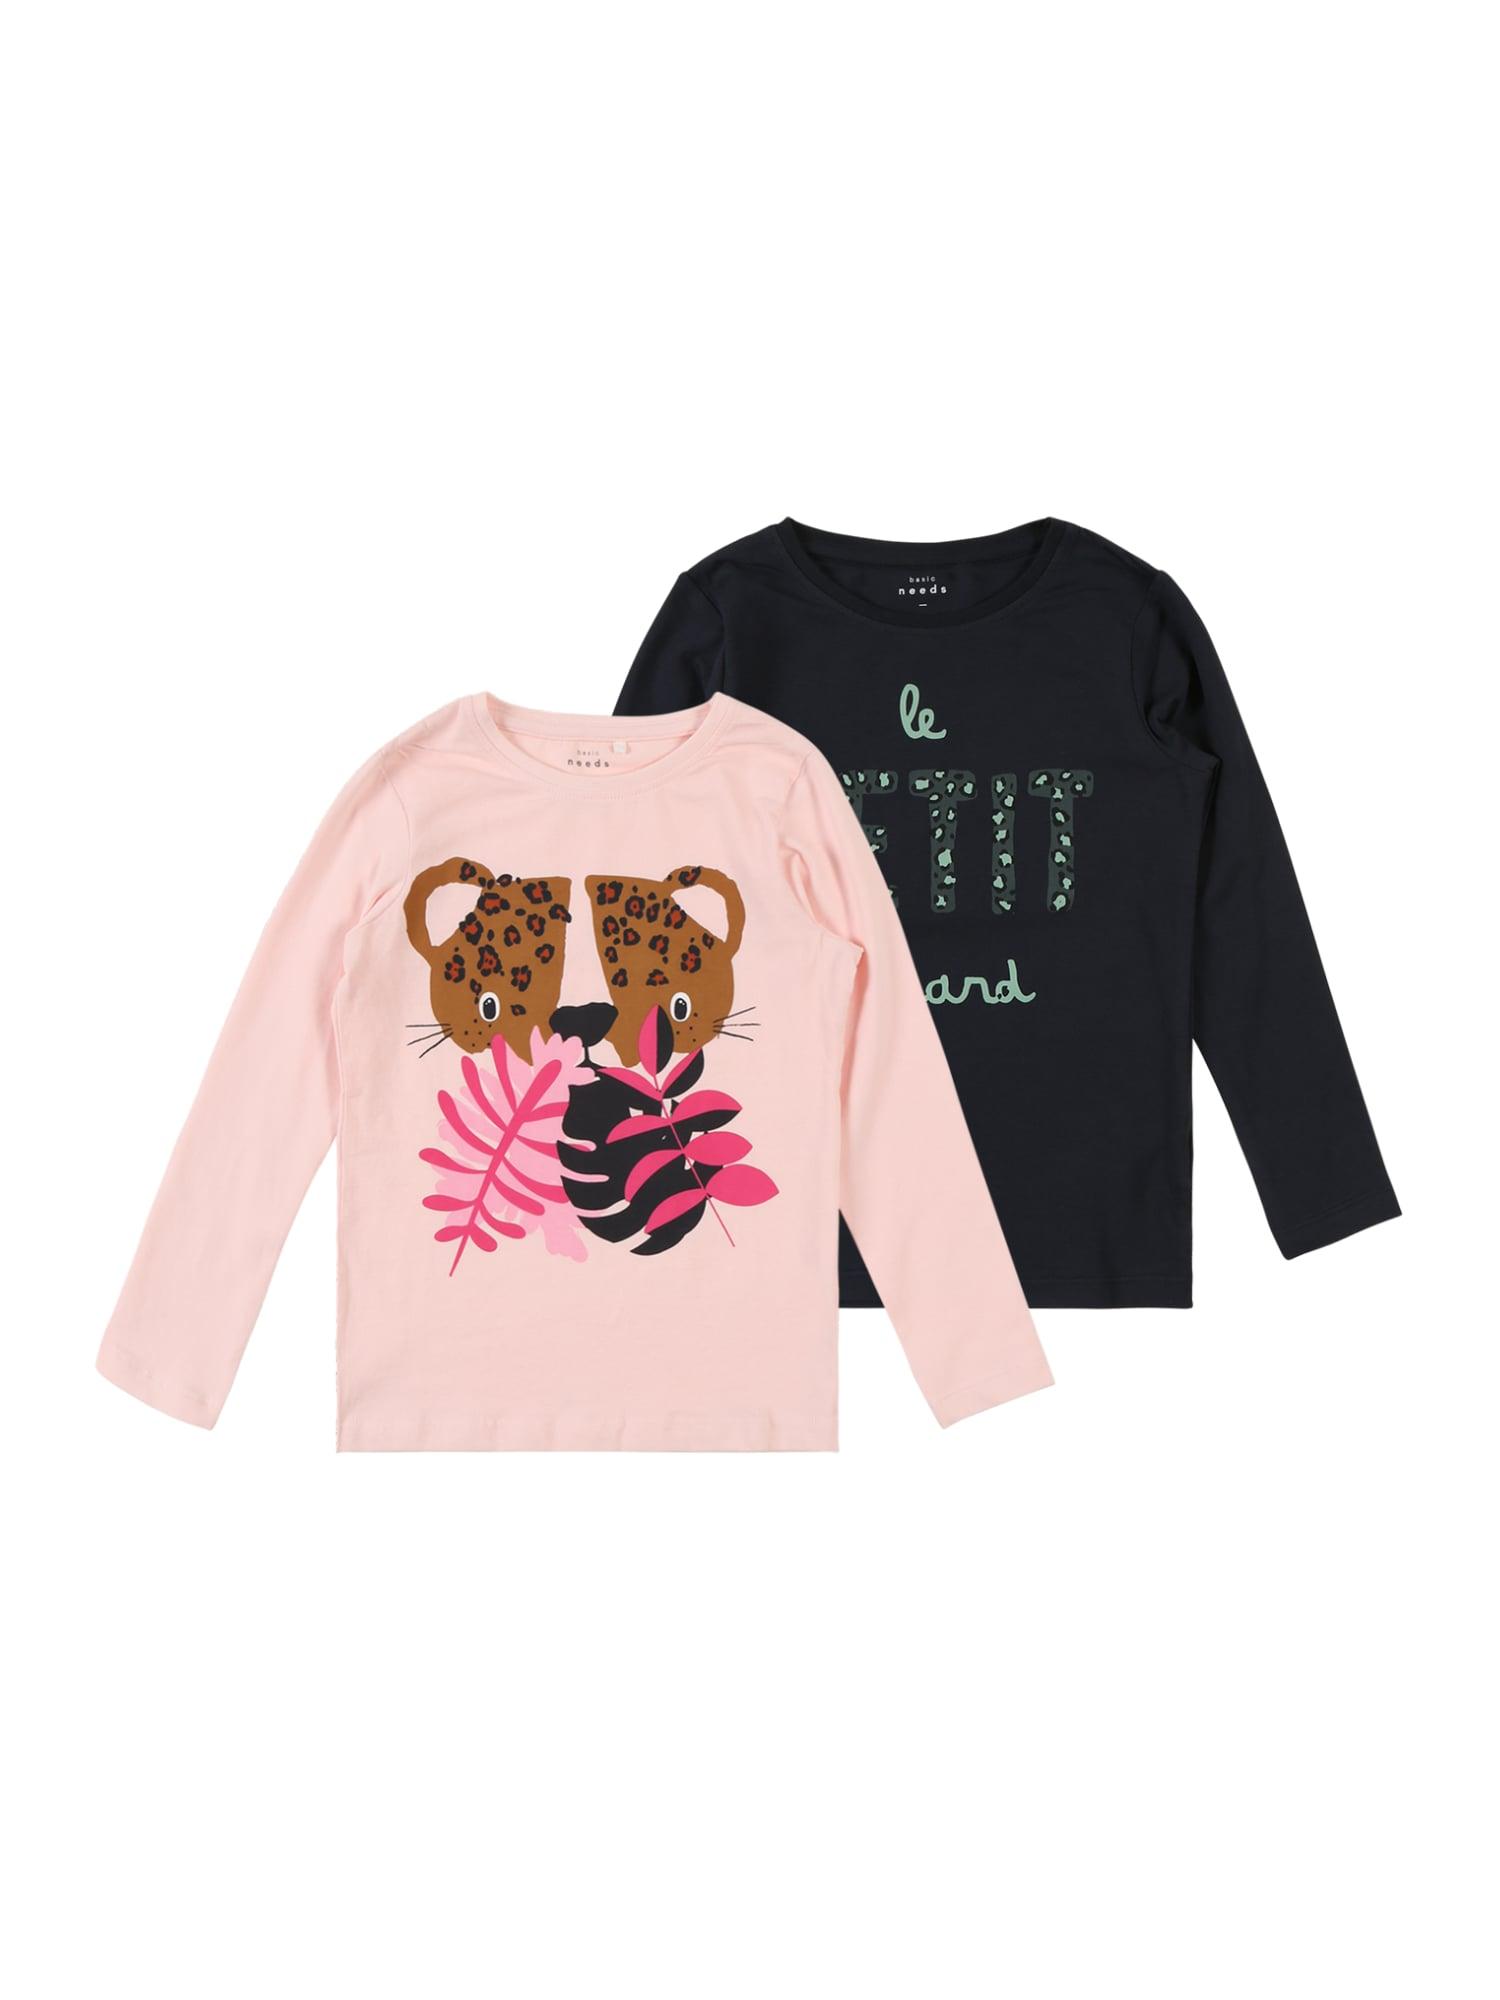 Tričko NMFVIX 2P LS TOP N pink černá NAME IT